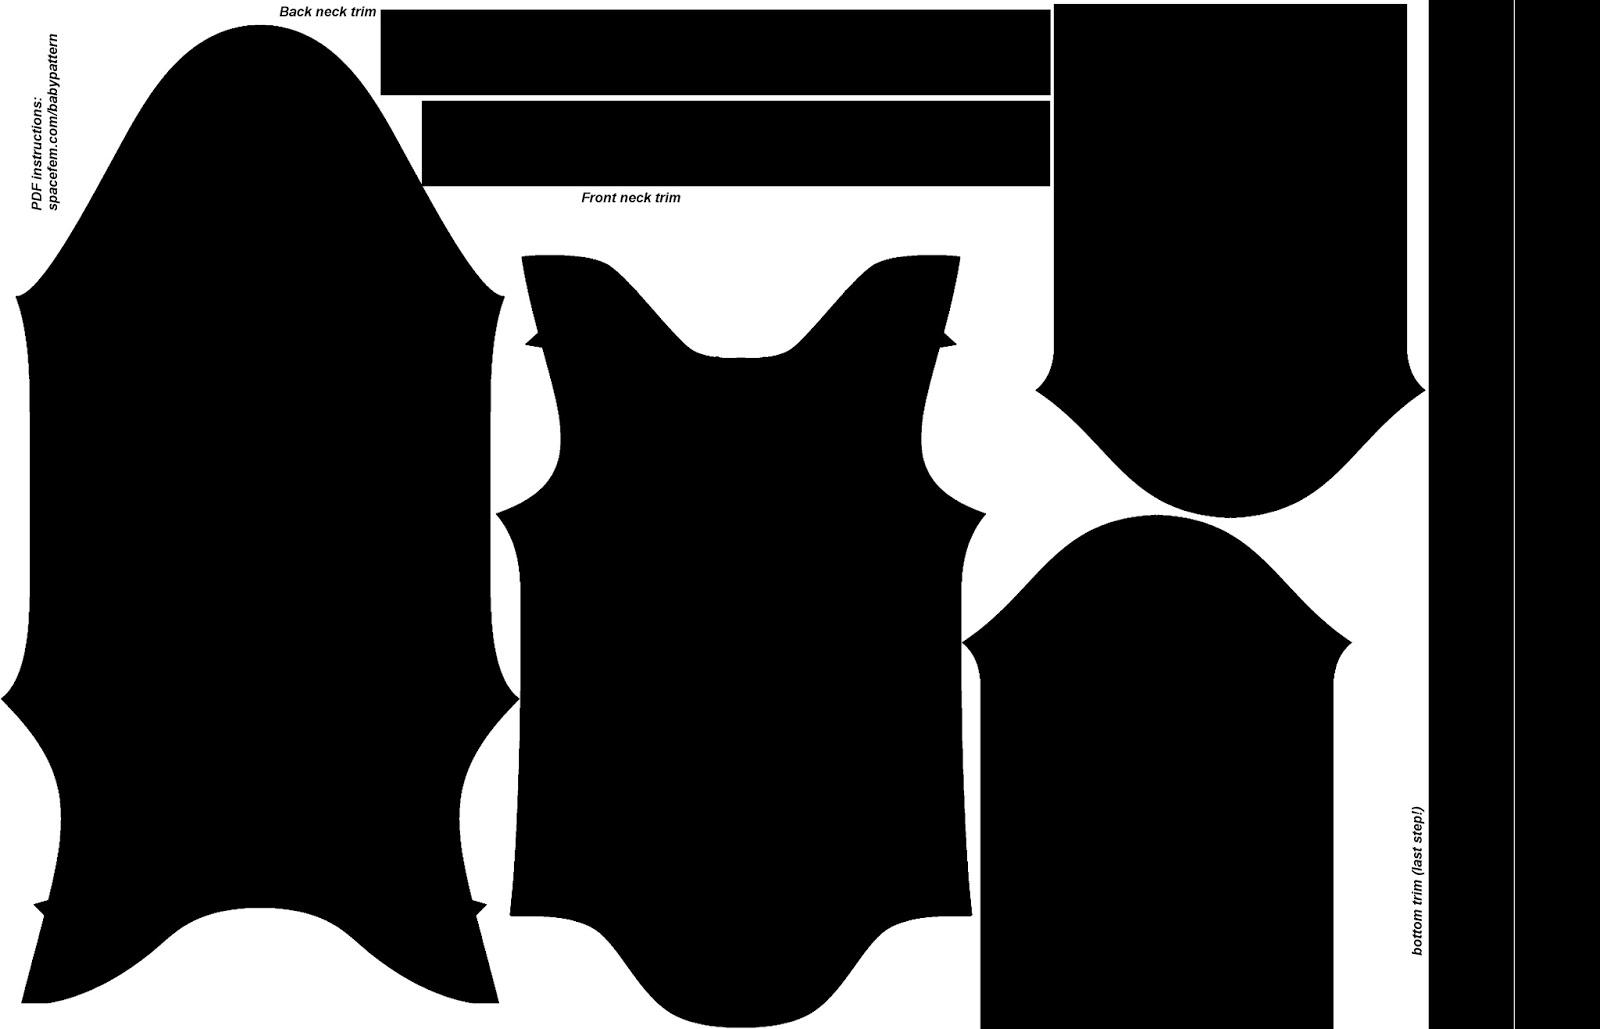 Spacefem: Design Your Own Baby Onesie! - Free Printable Onesie Pattern